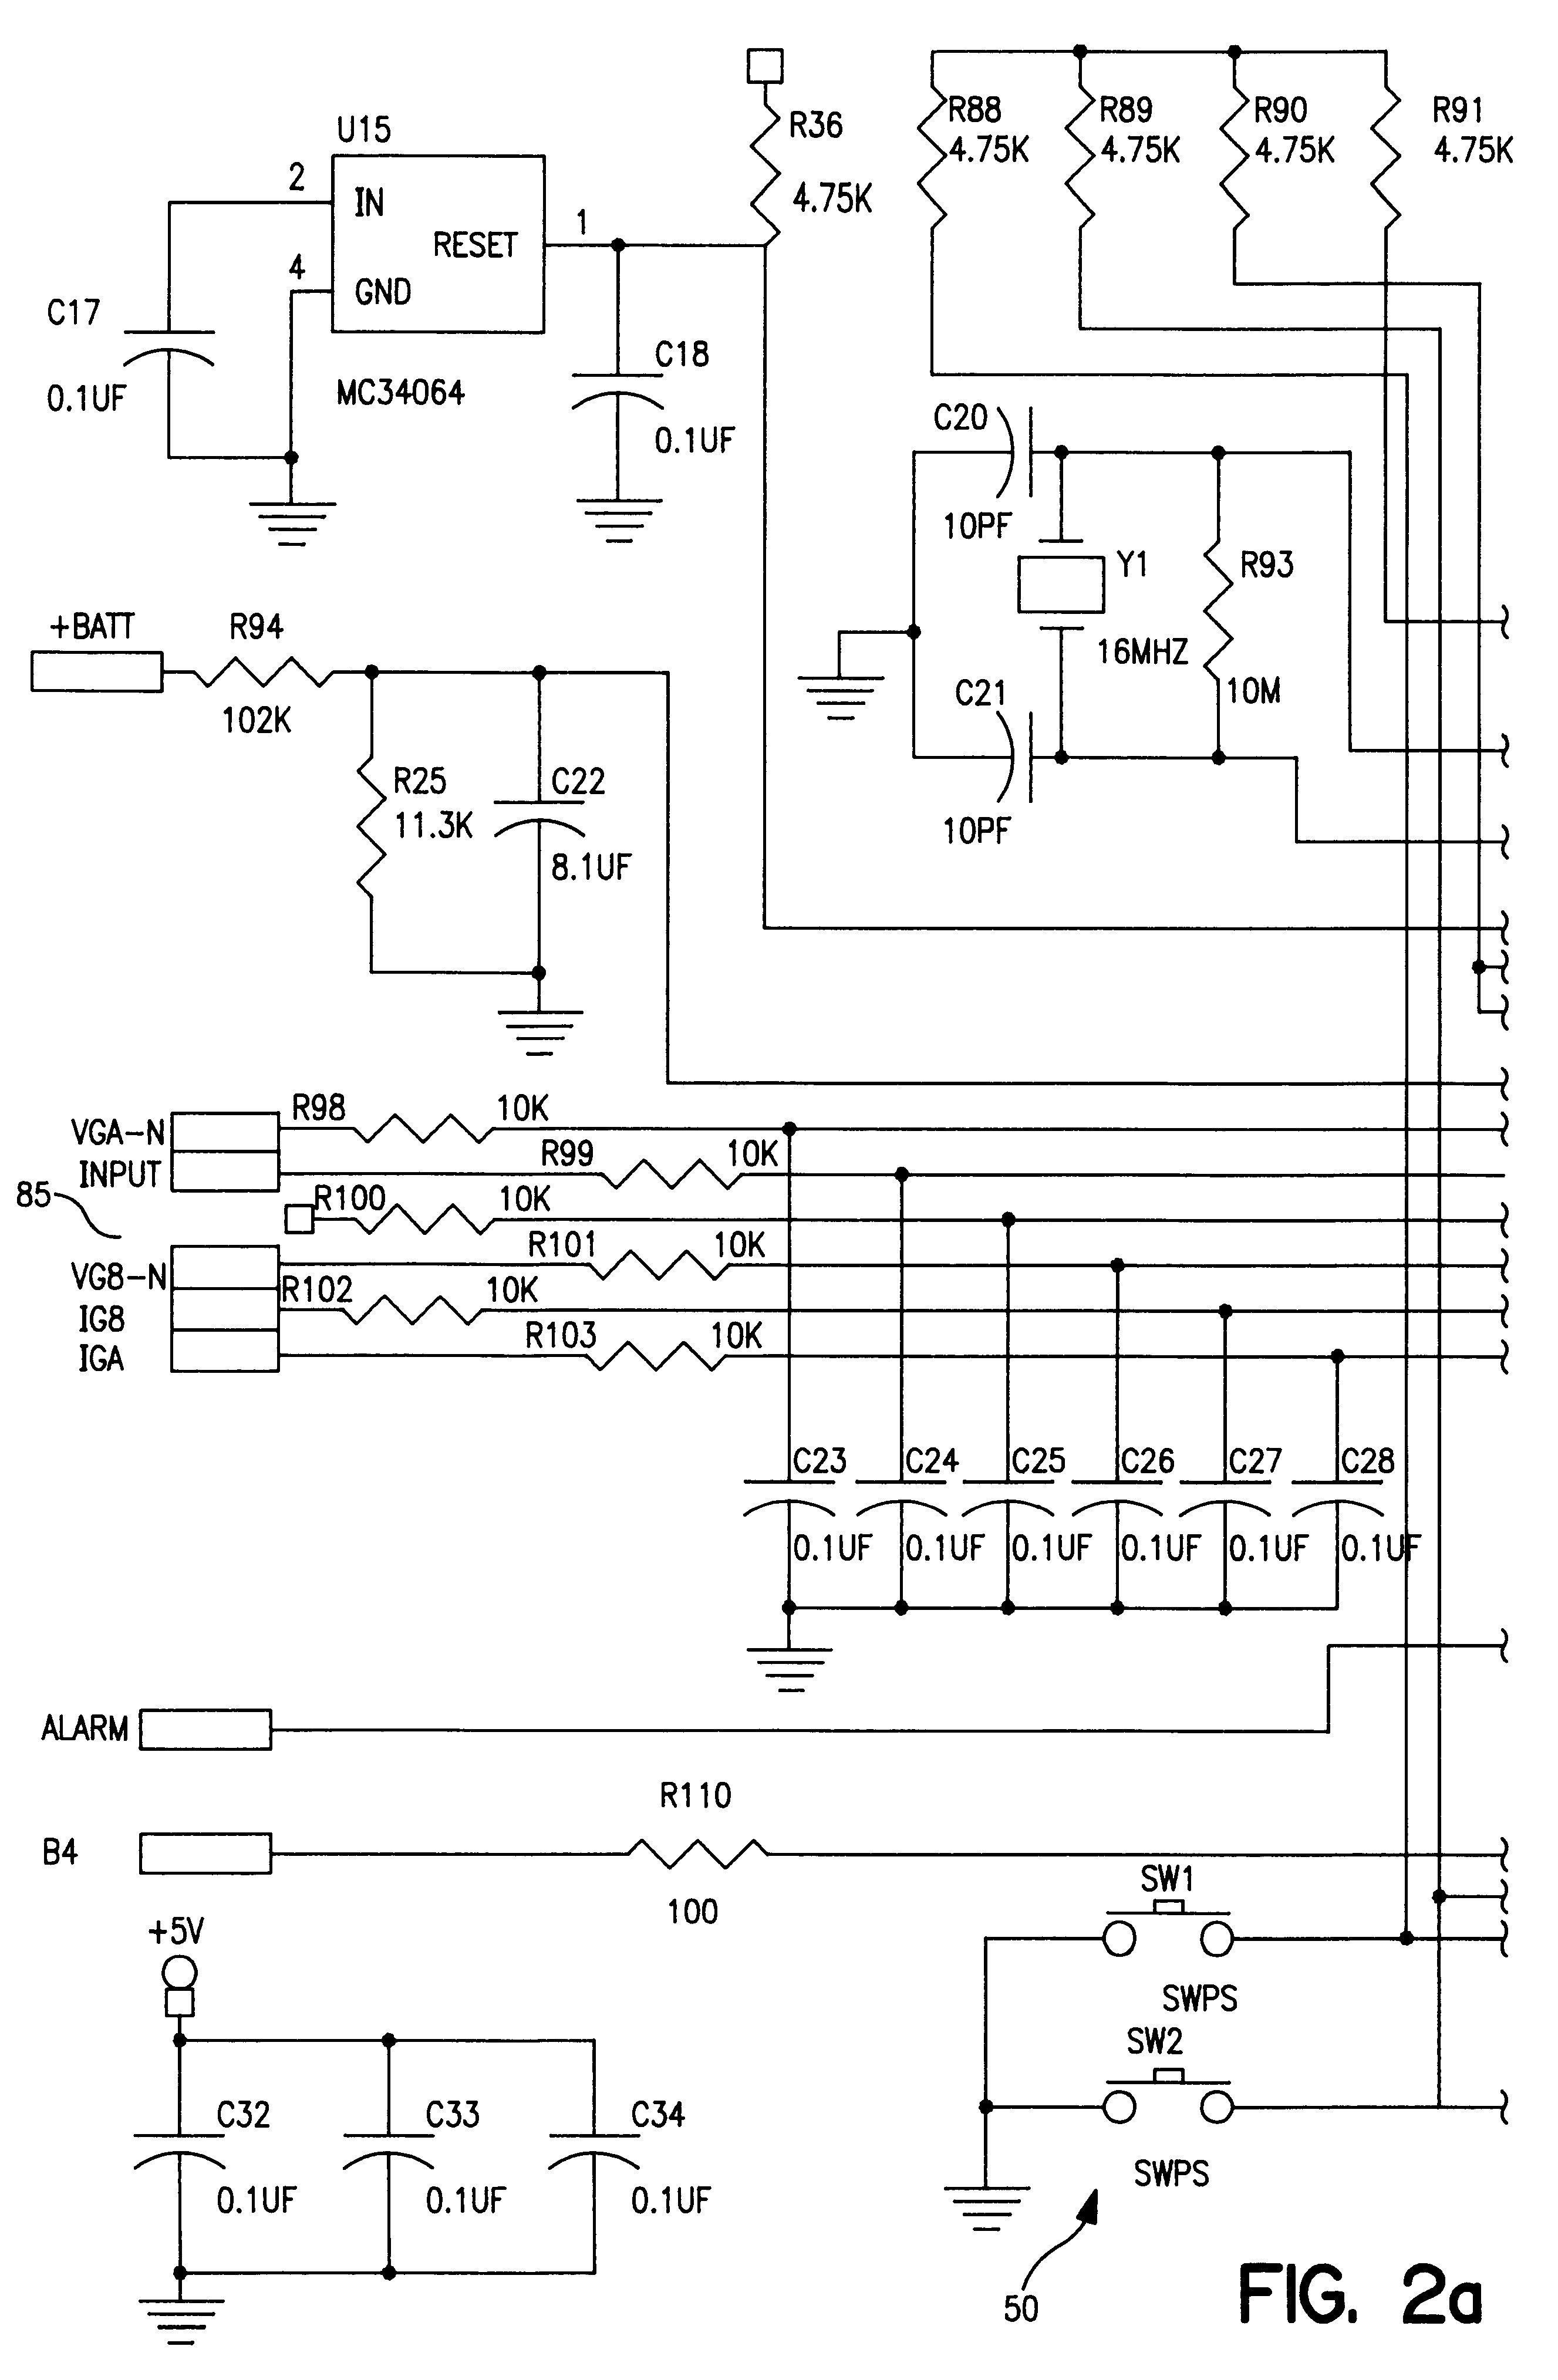 Generac Ats Wiring Diagram from i.pinimg.com